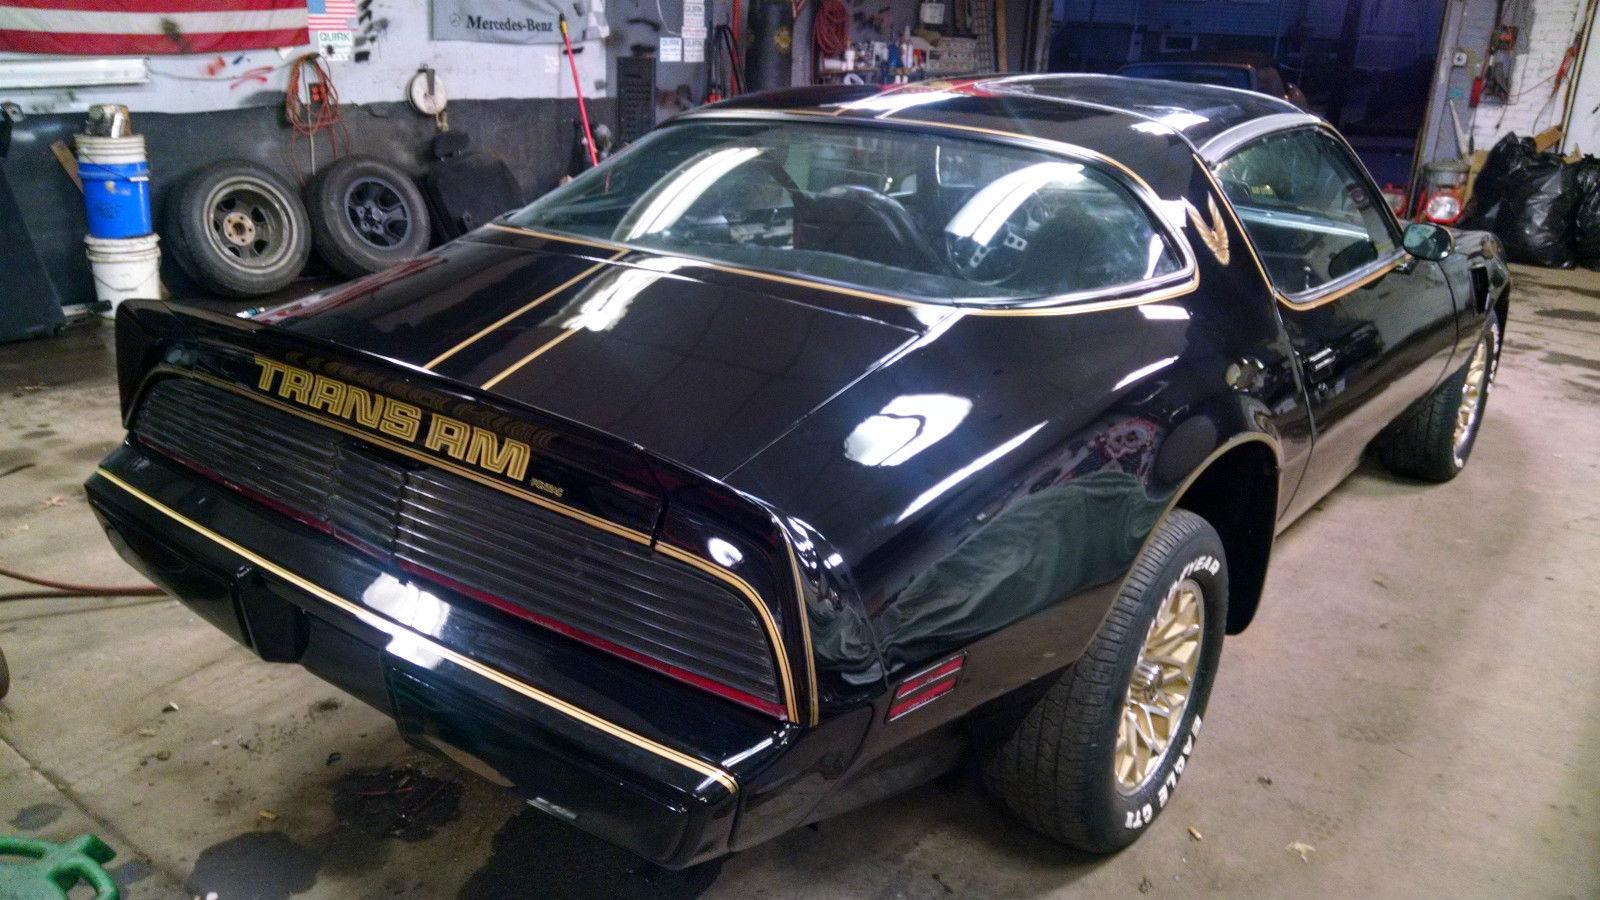 1979 Trans Am Special Edition BANDIT - Classic Pontiac